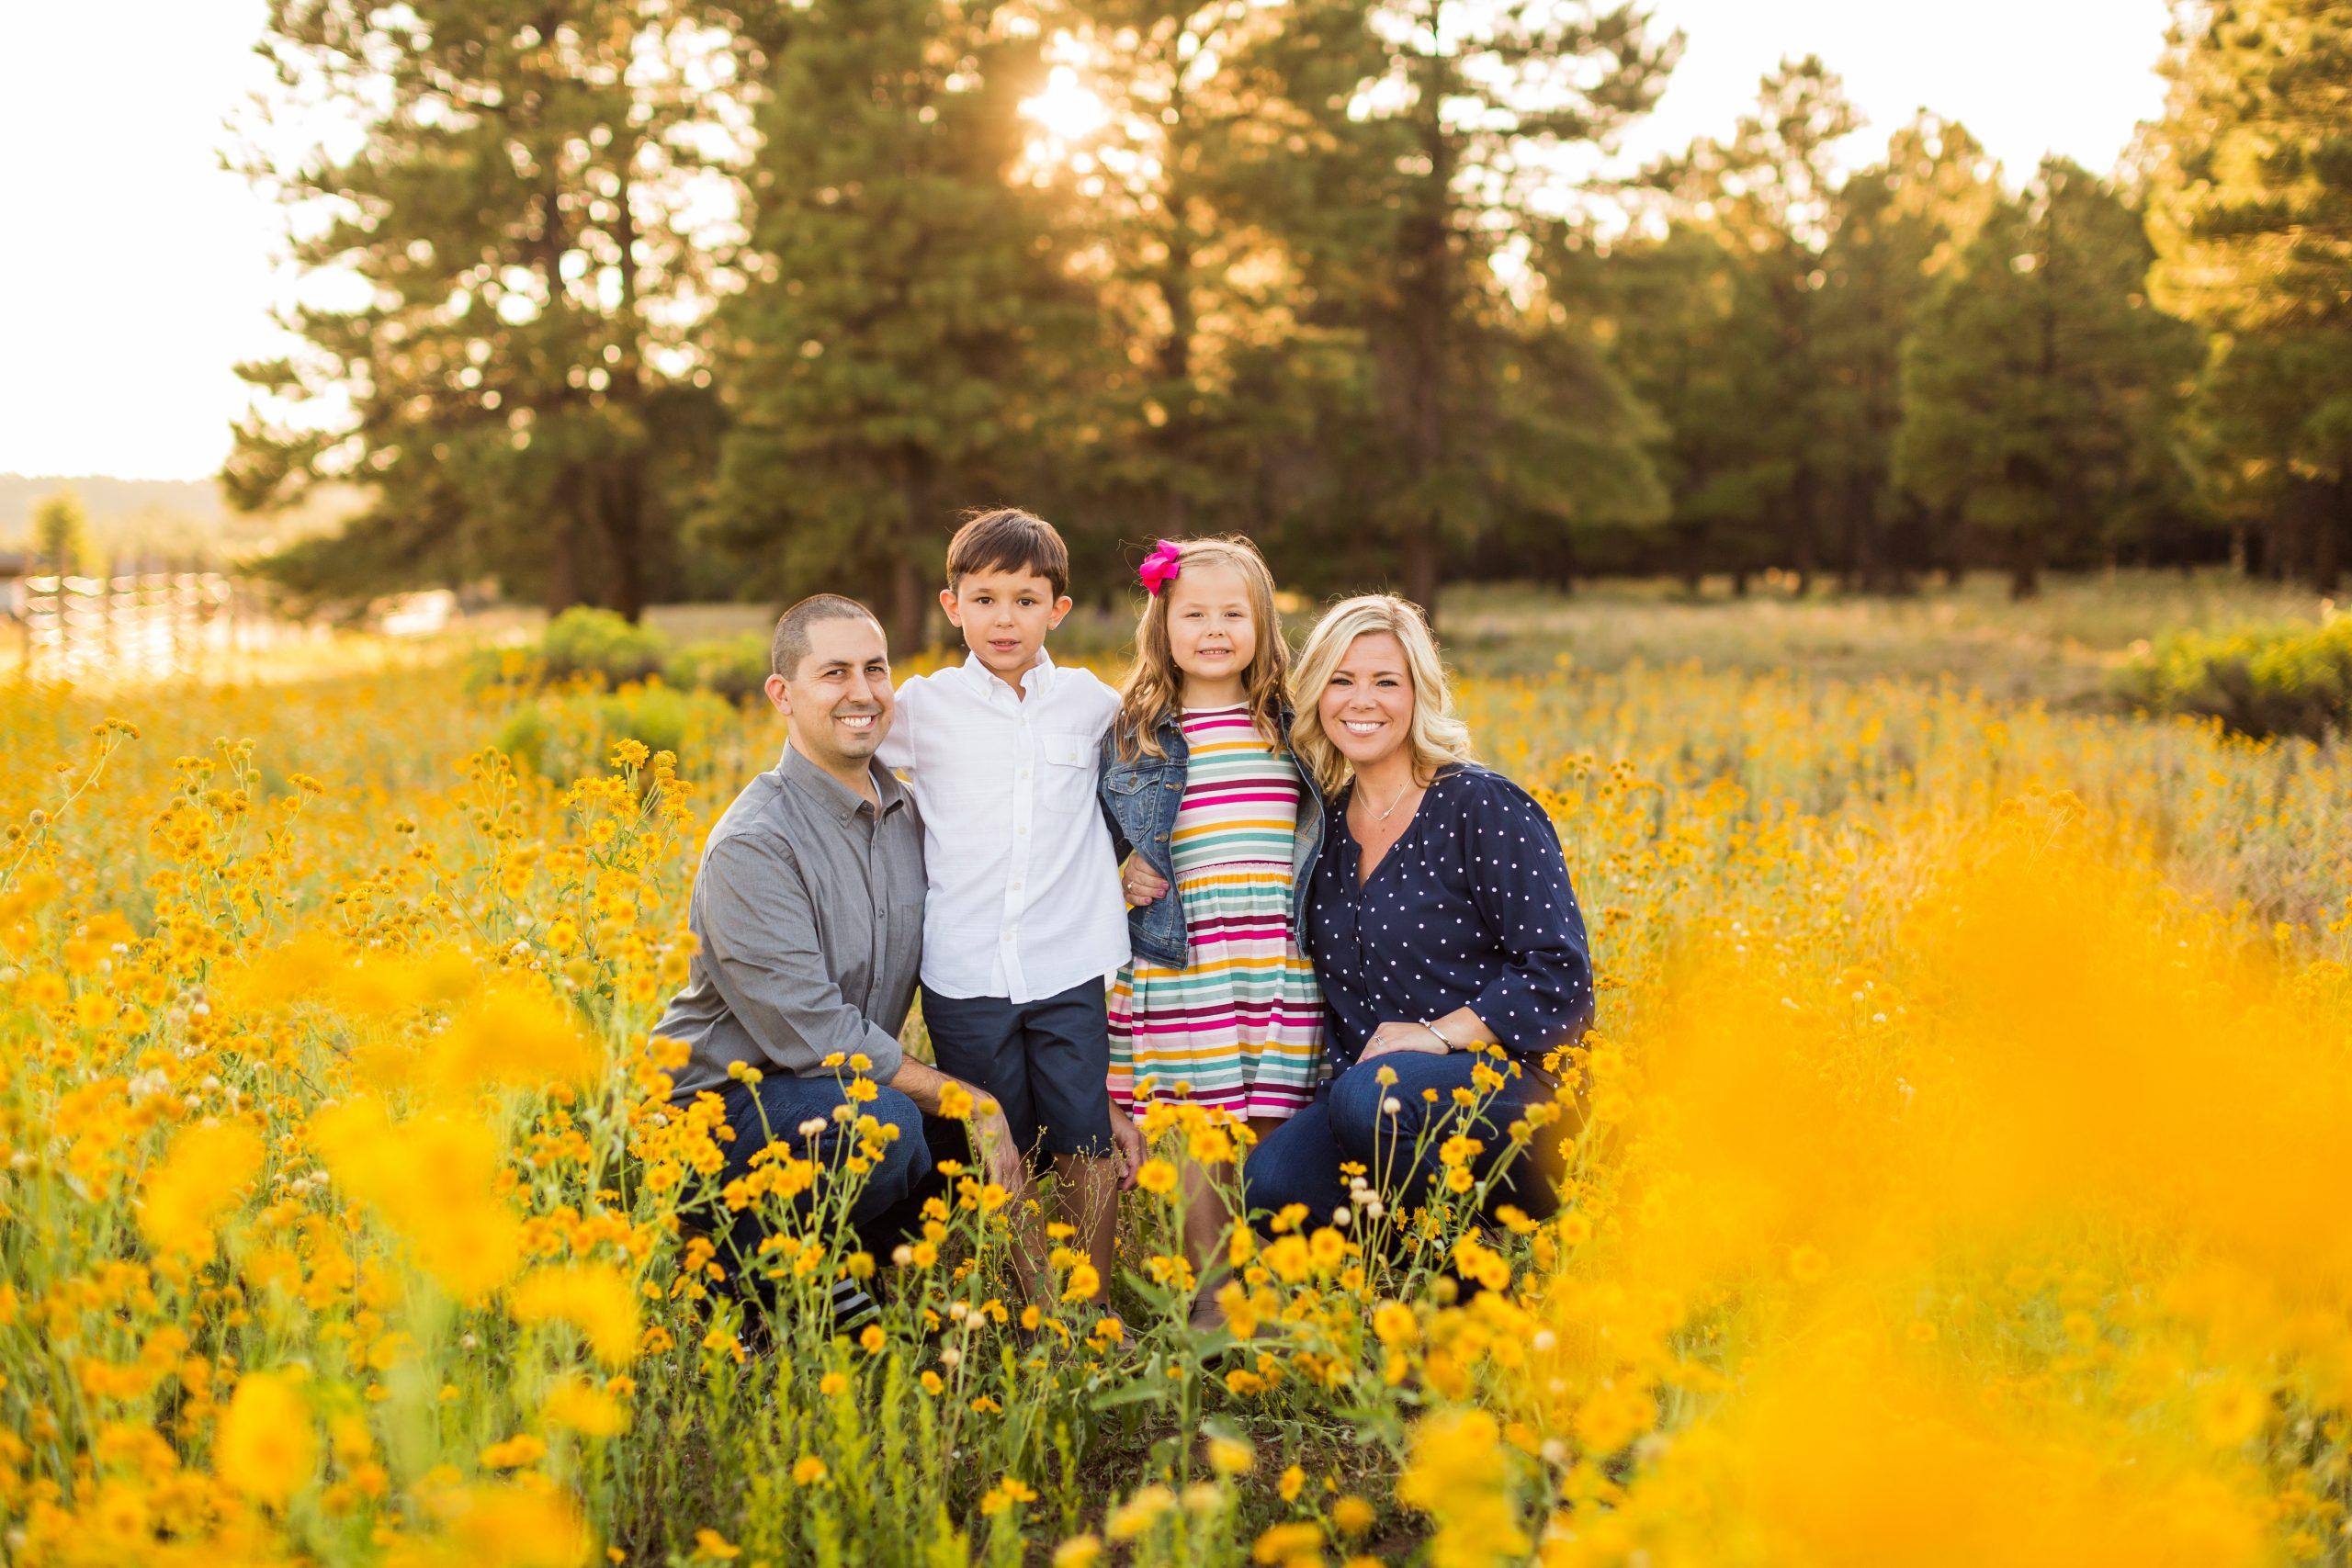 Flagstaff Arizona Top 5 Things to Do Wildflowers